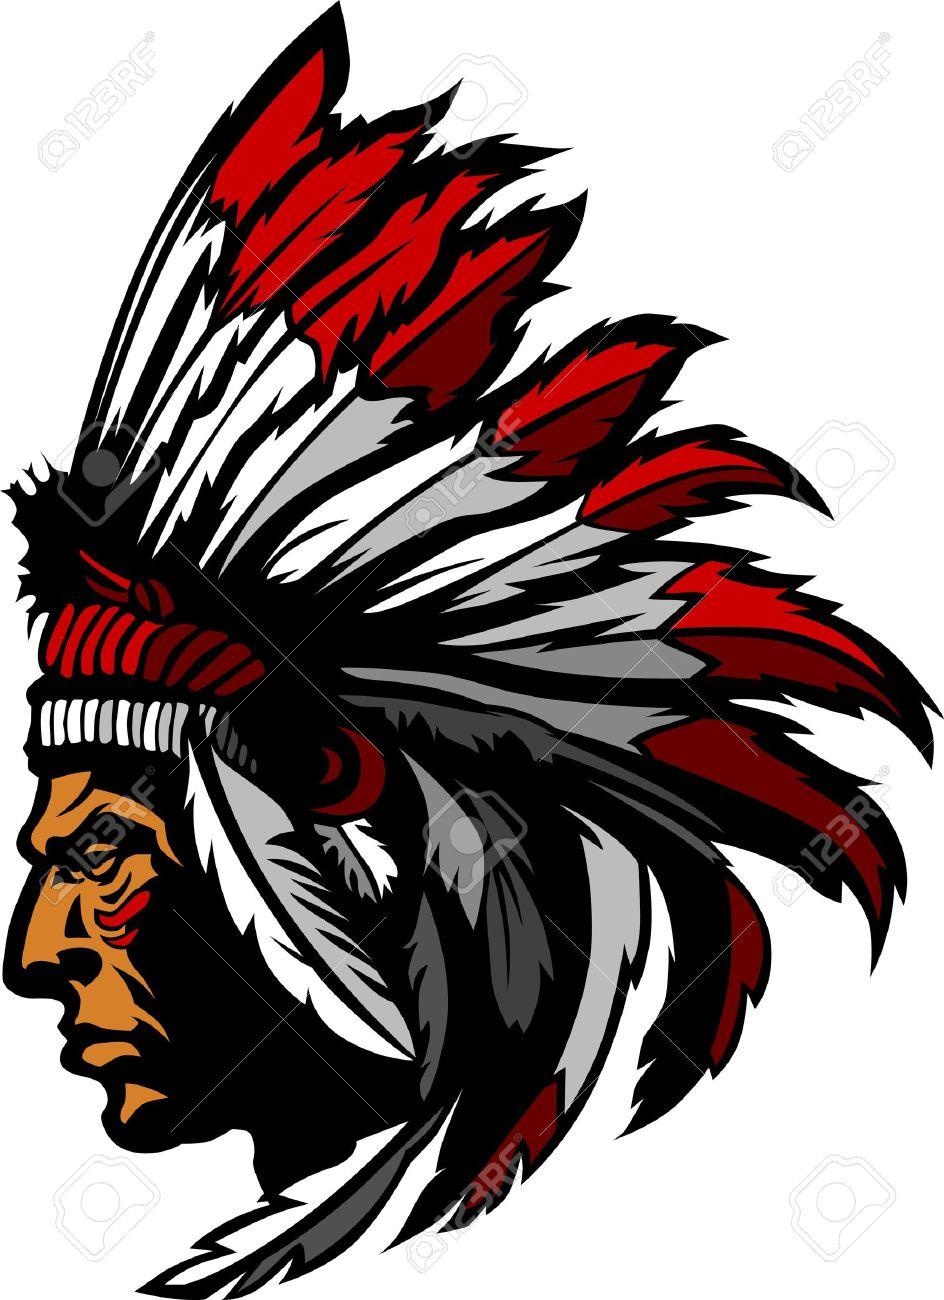 Indian Chief Mascot Head Graphic Standard-Bild - 10311813